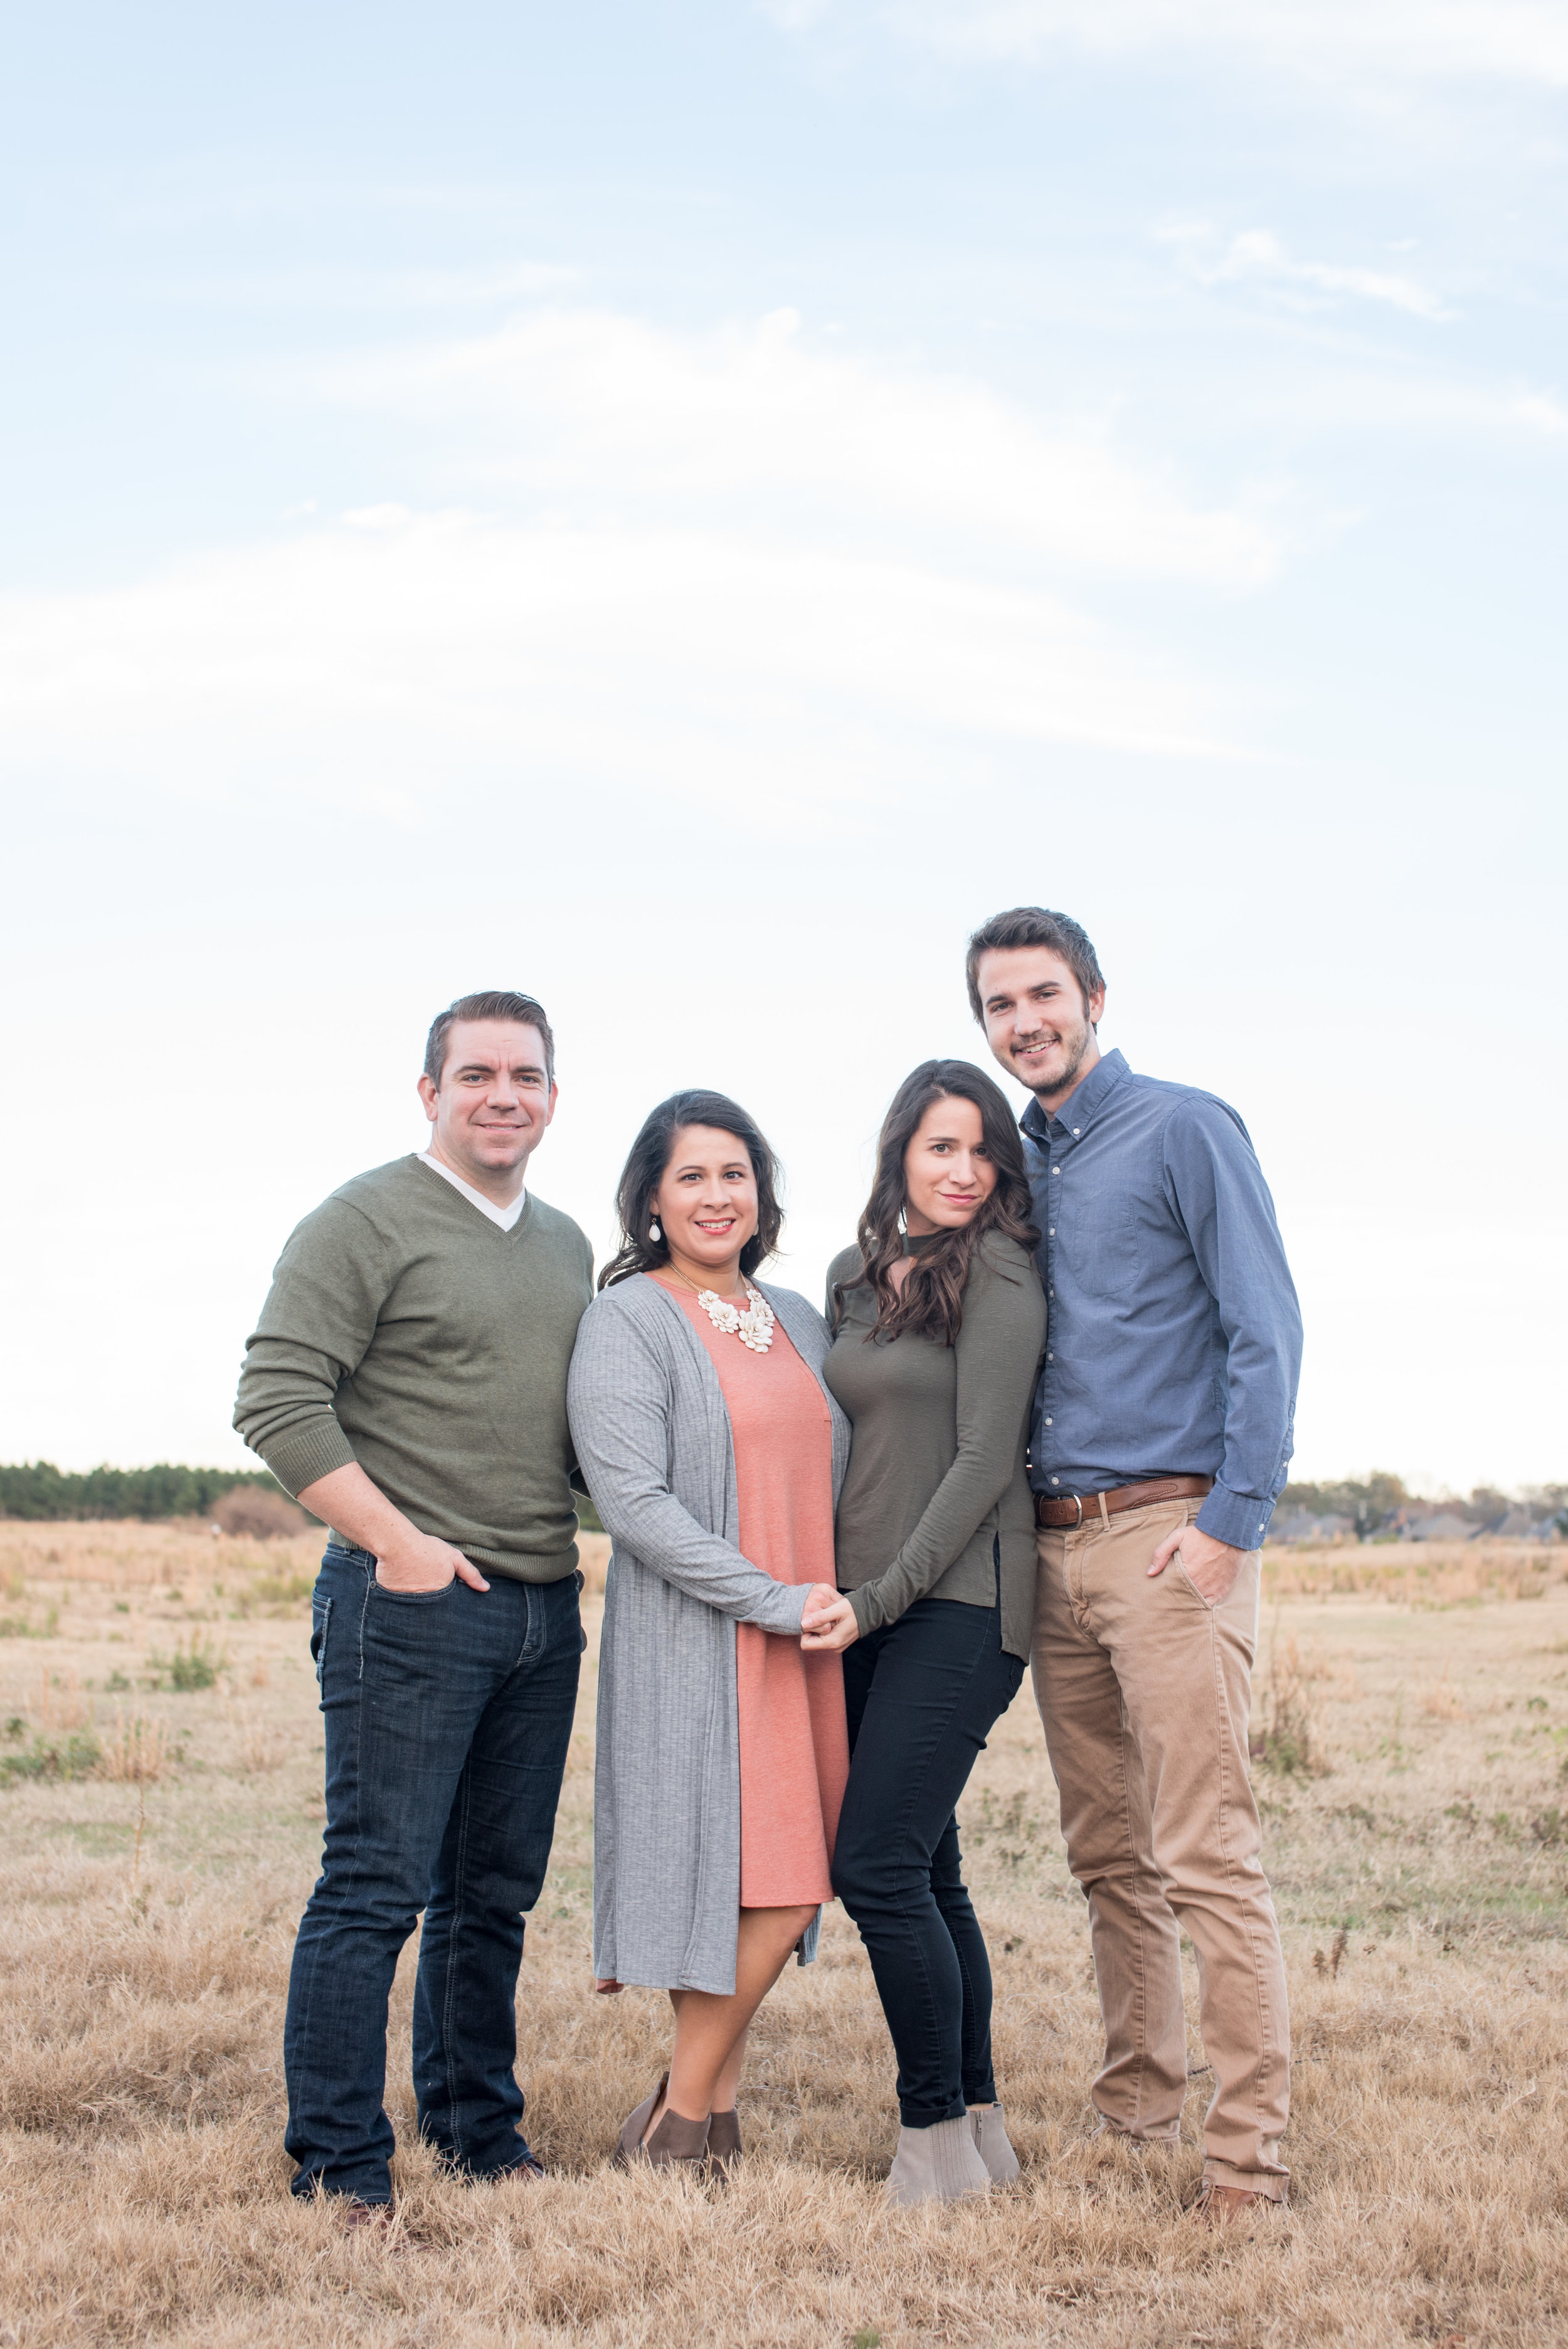 mmilesfamily-34.jpg